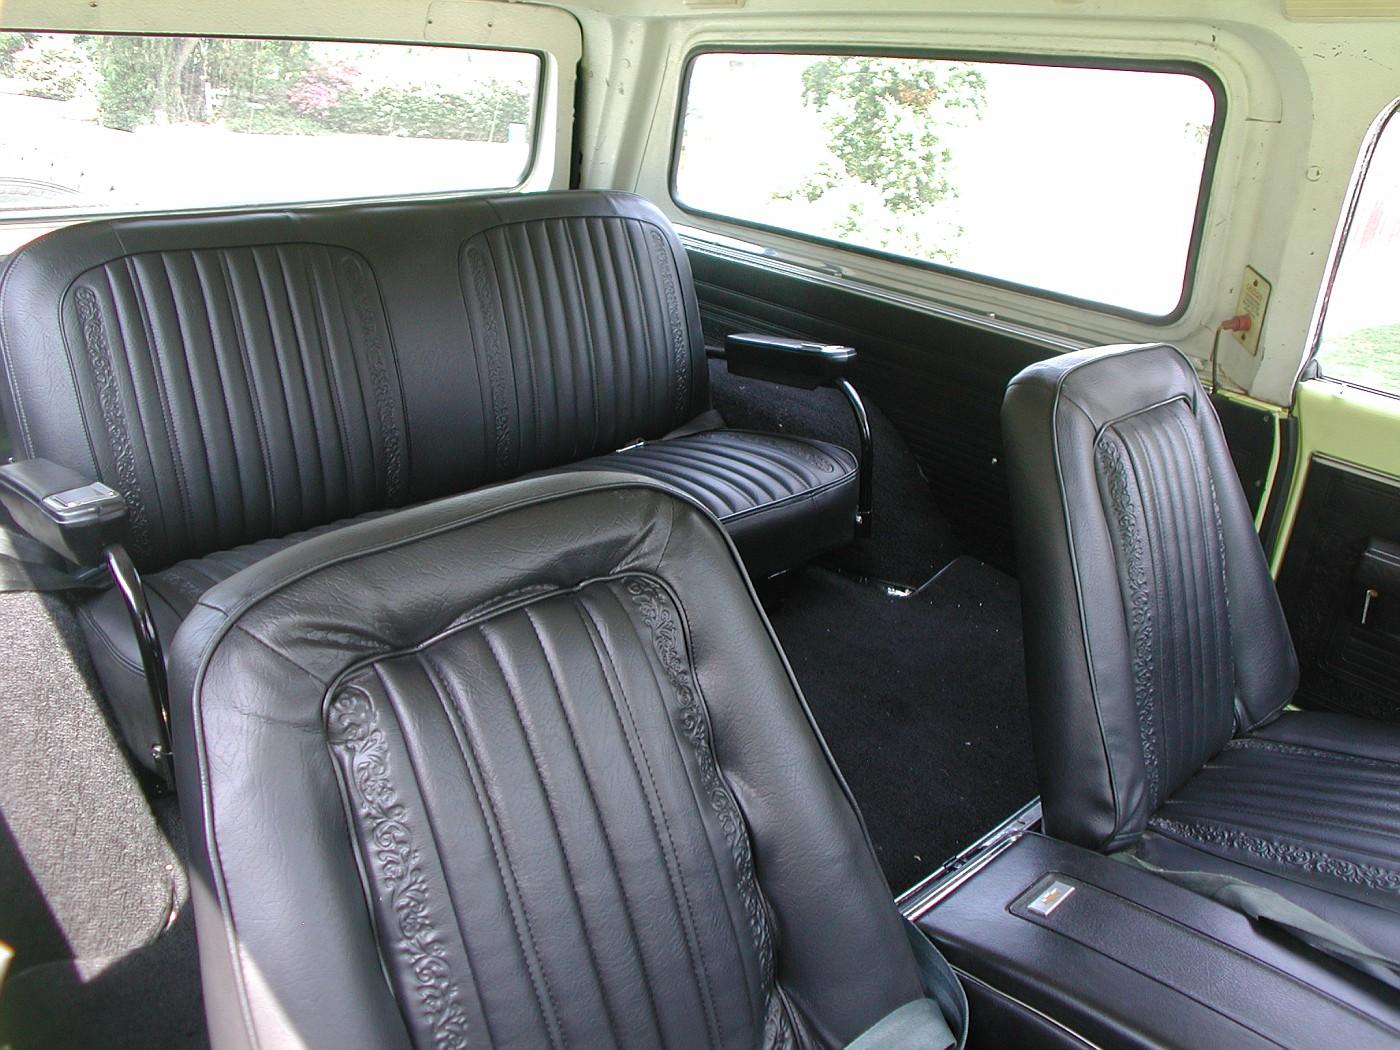 Bucket Seat Foam Repair - The 1947 - Present Chevrolet ...